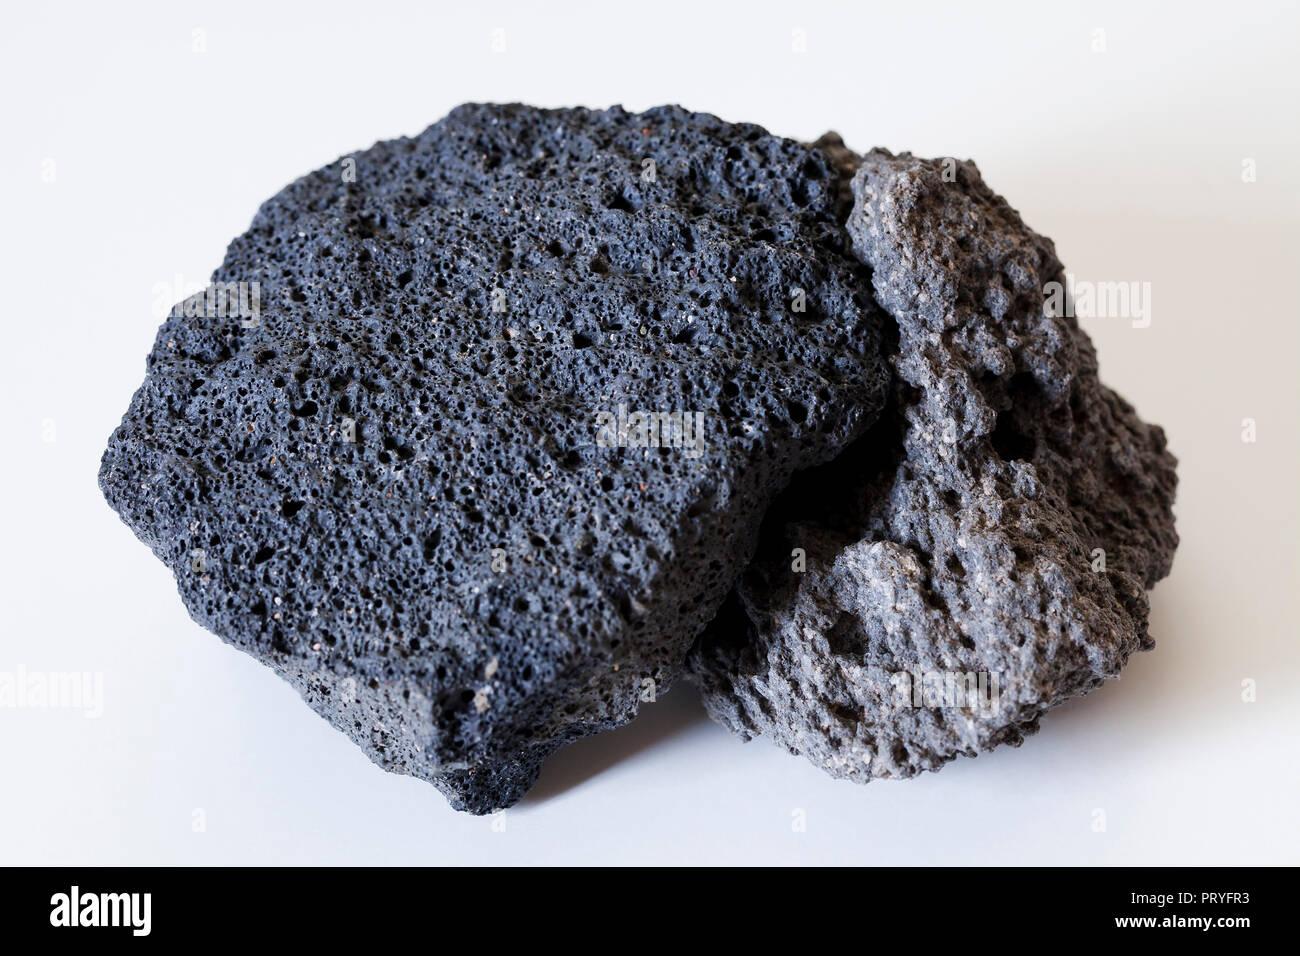 Igneous Rock Scoria Volcanic Rock Lava Rock Showing Vesicles